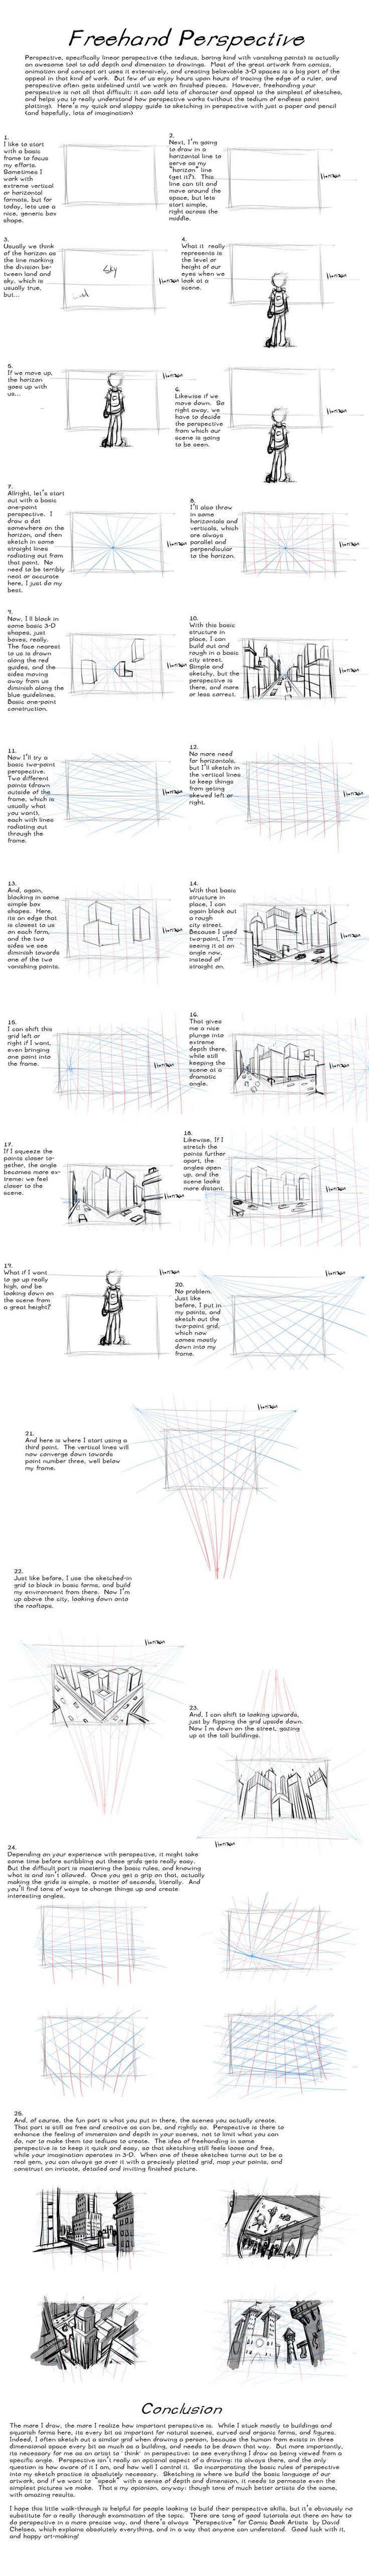 Freehand Perspective Drawing Tutorial by AdamMasterman.deviantart.com on @deviantART